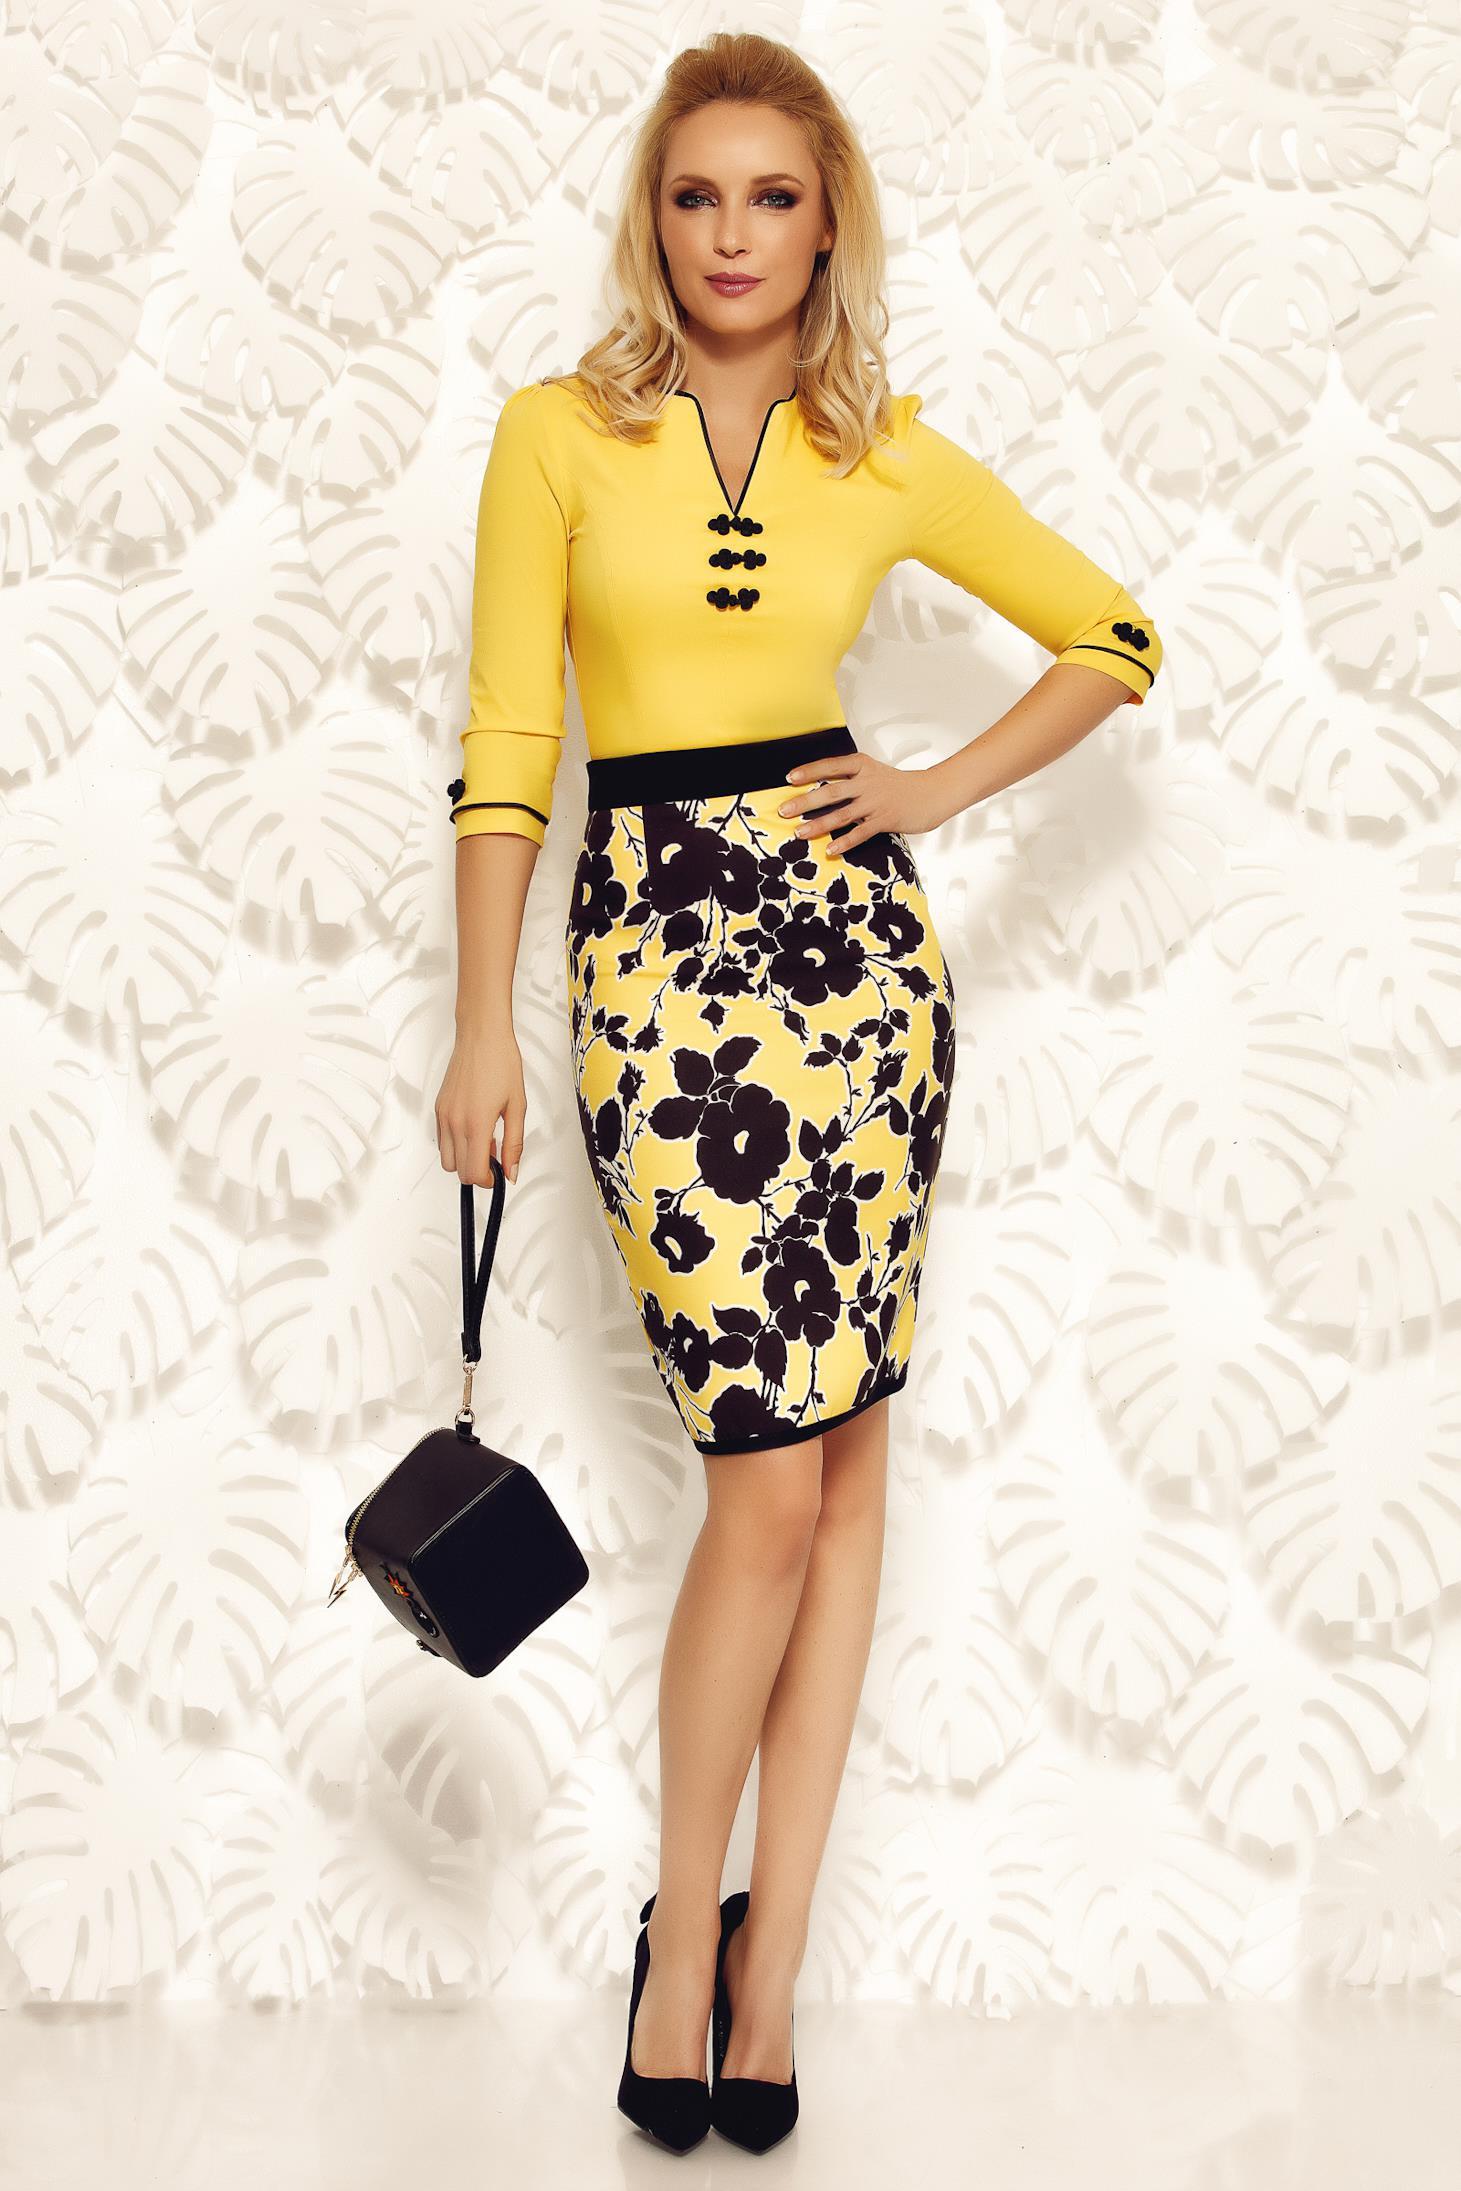 b36ddfe199 fofy-yellow-office-high-waisted-pencil-skirt-soft--S035267-1-344234.jpg